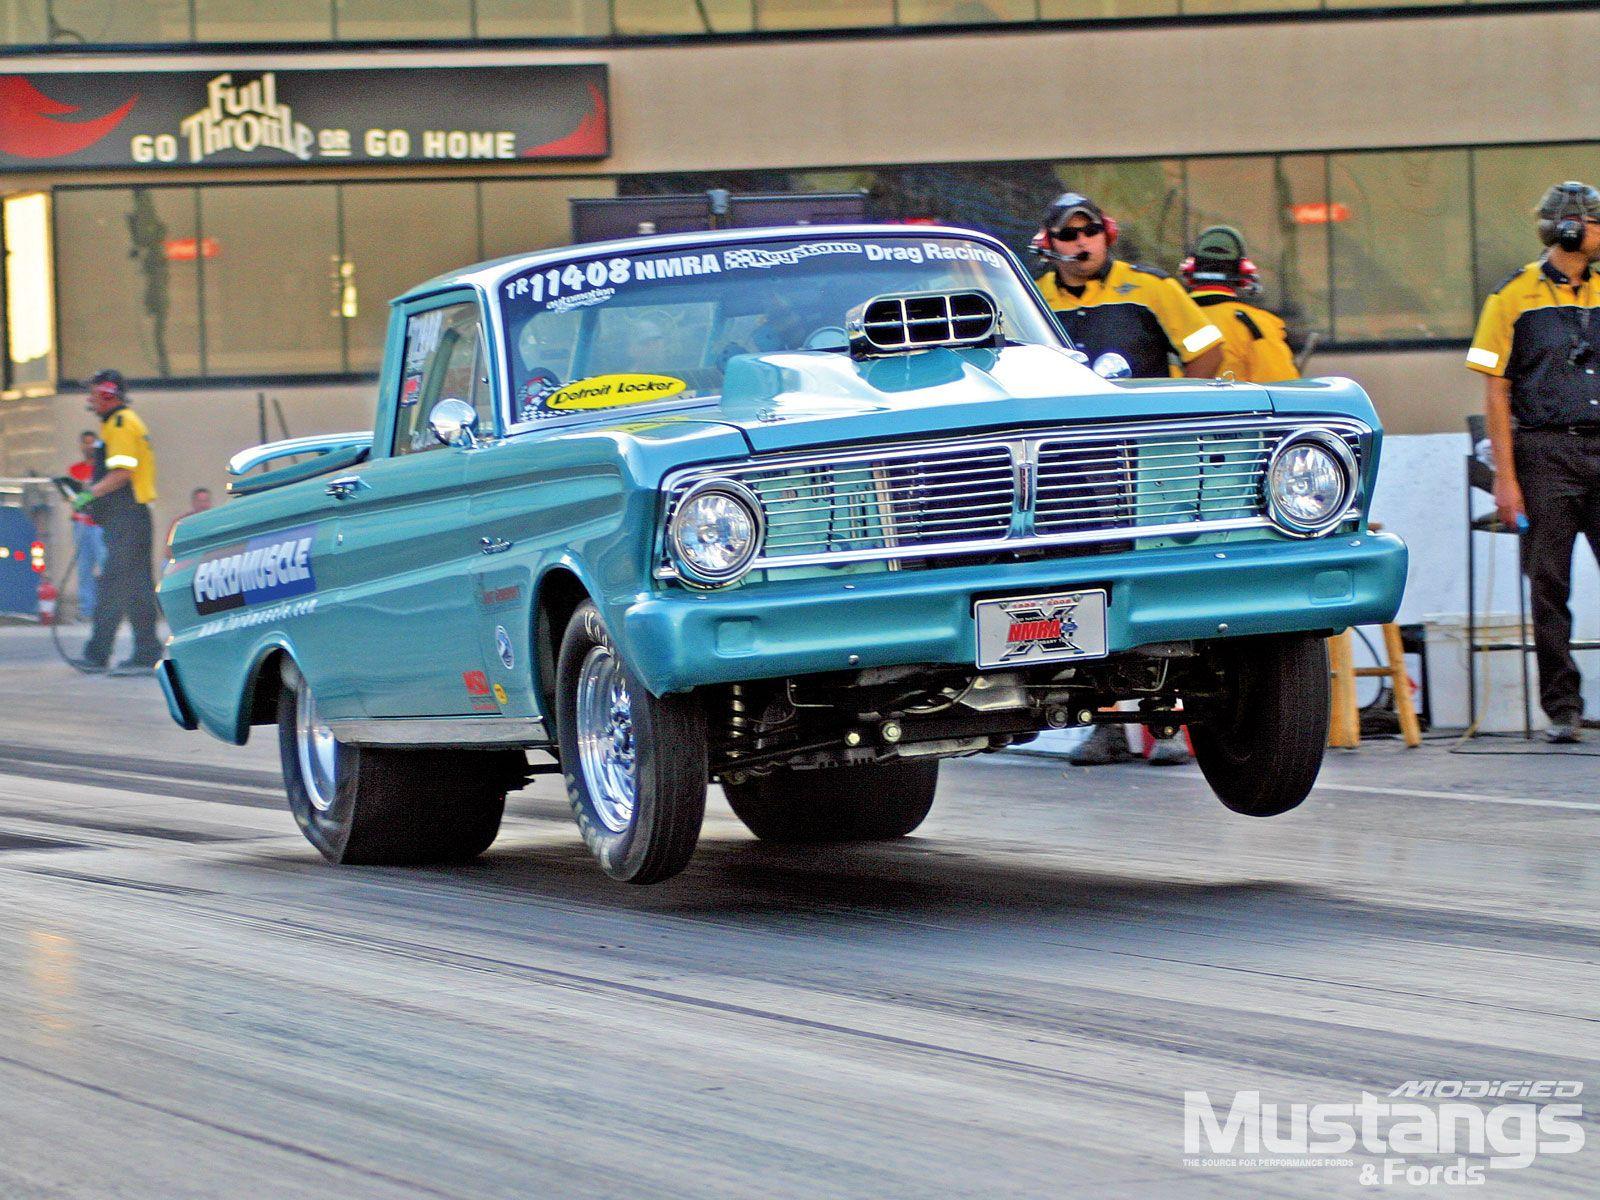 Falcon ranchero ford drag racing race car hot rod wallpaper